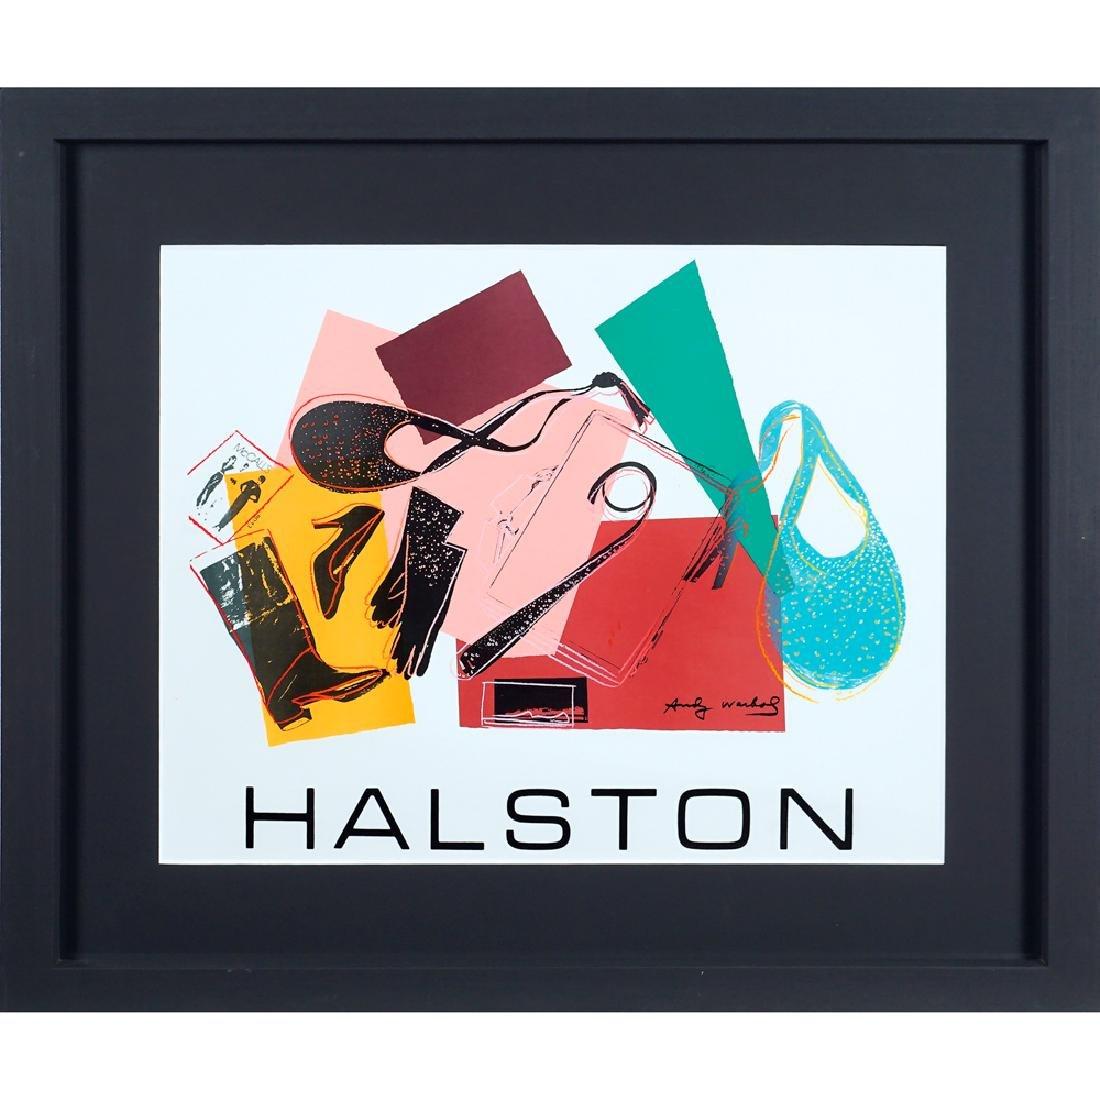 Andy Warhol Pittsburgh 1928 1928 - New York 1987